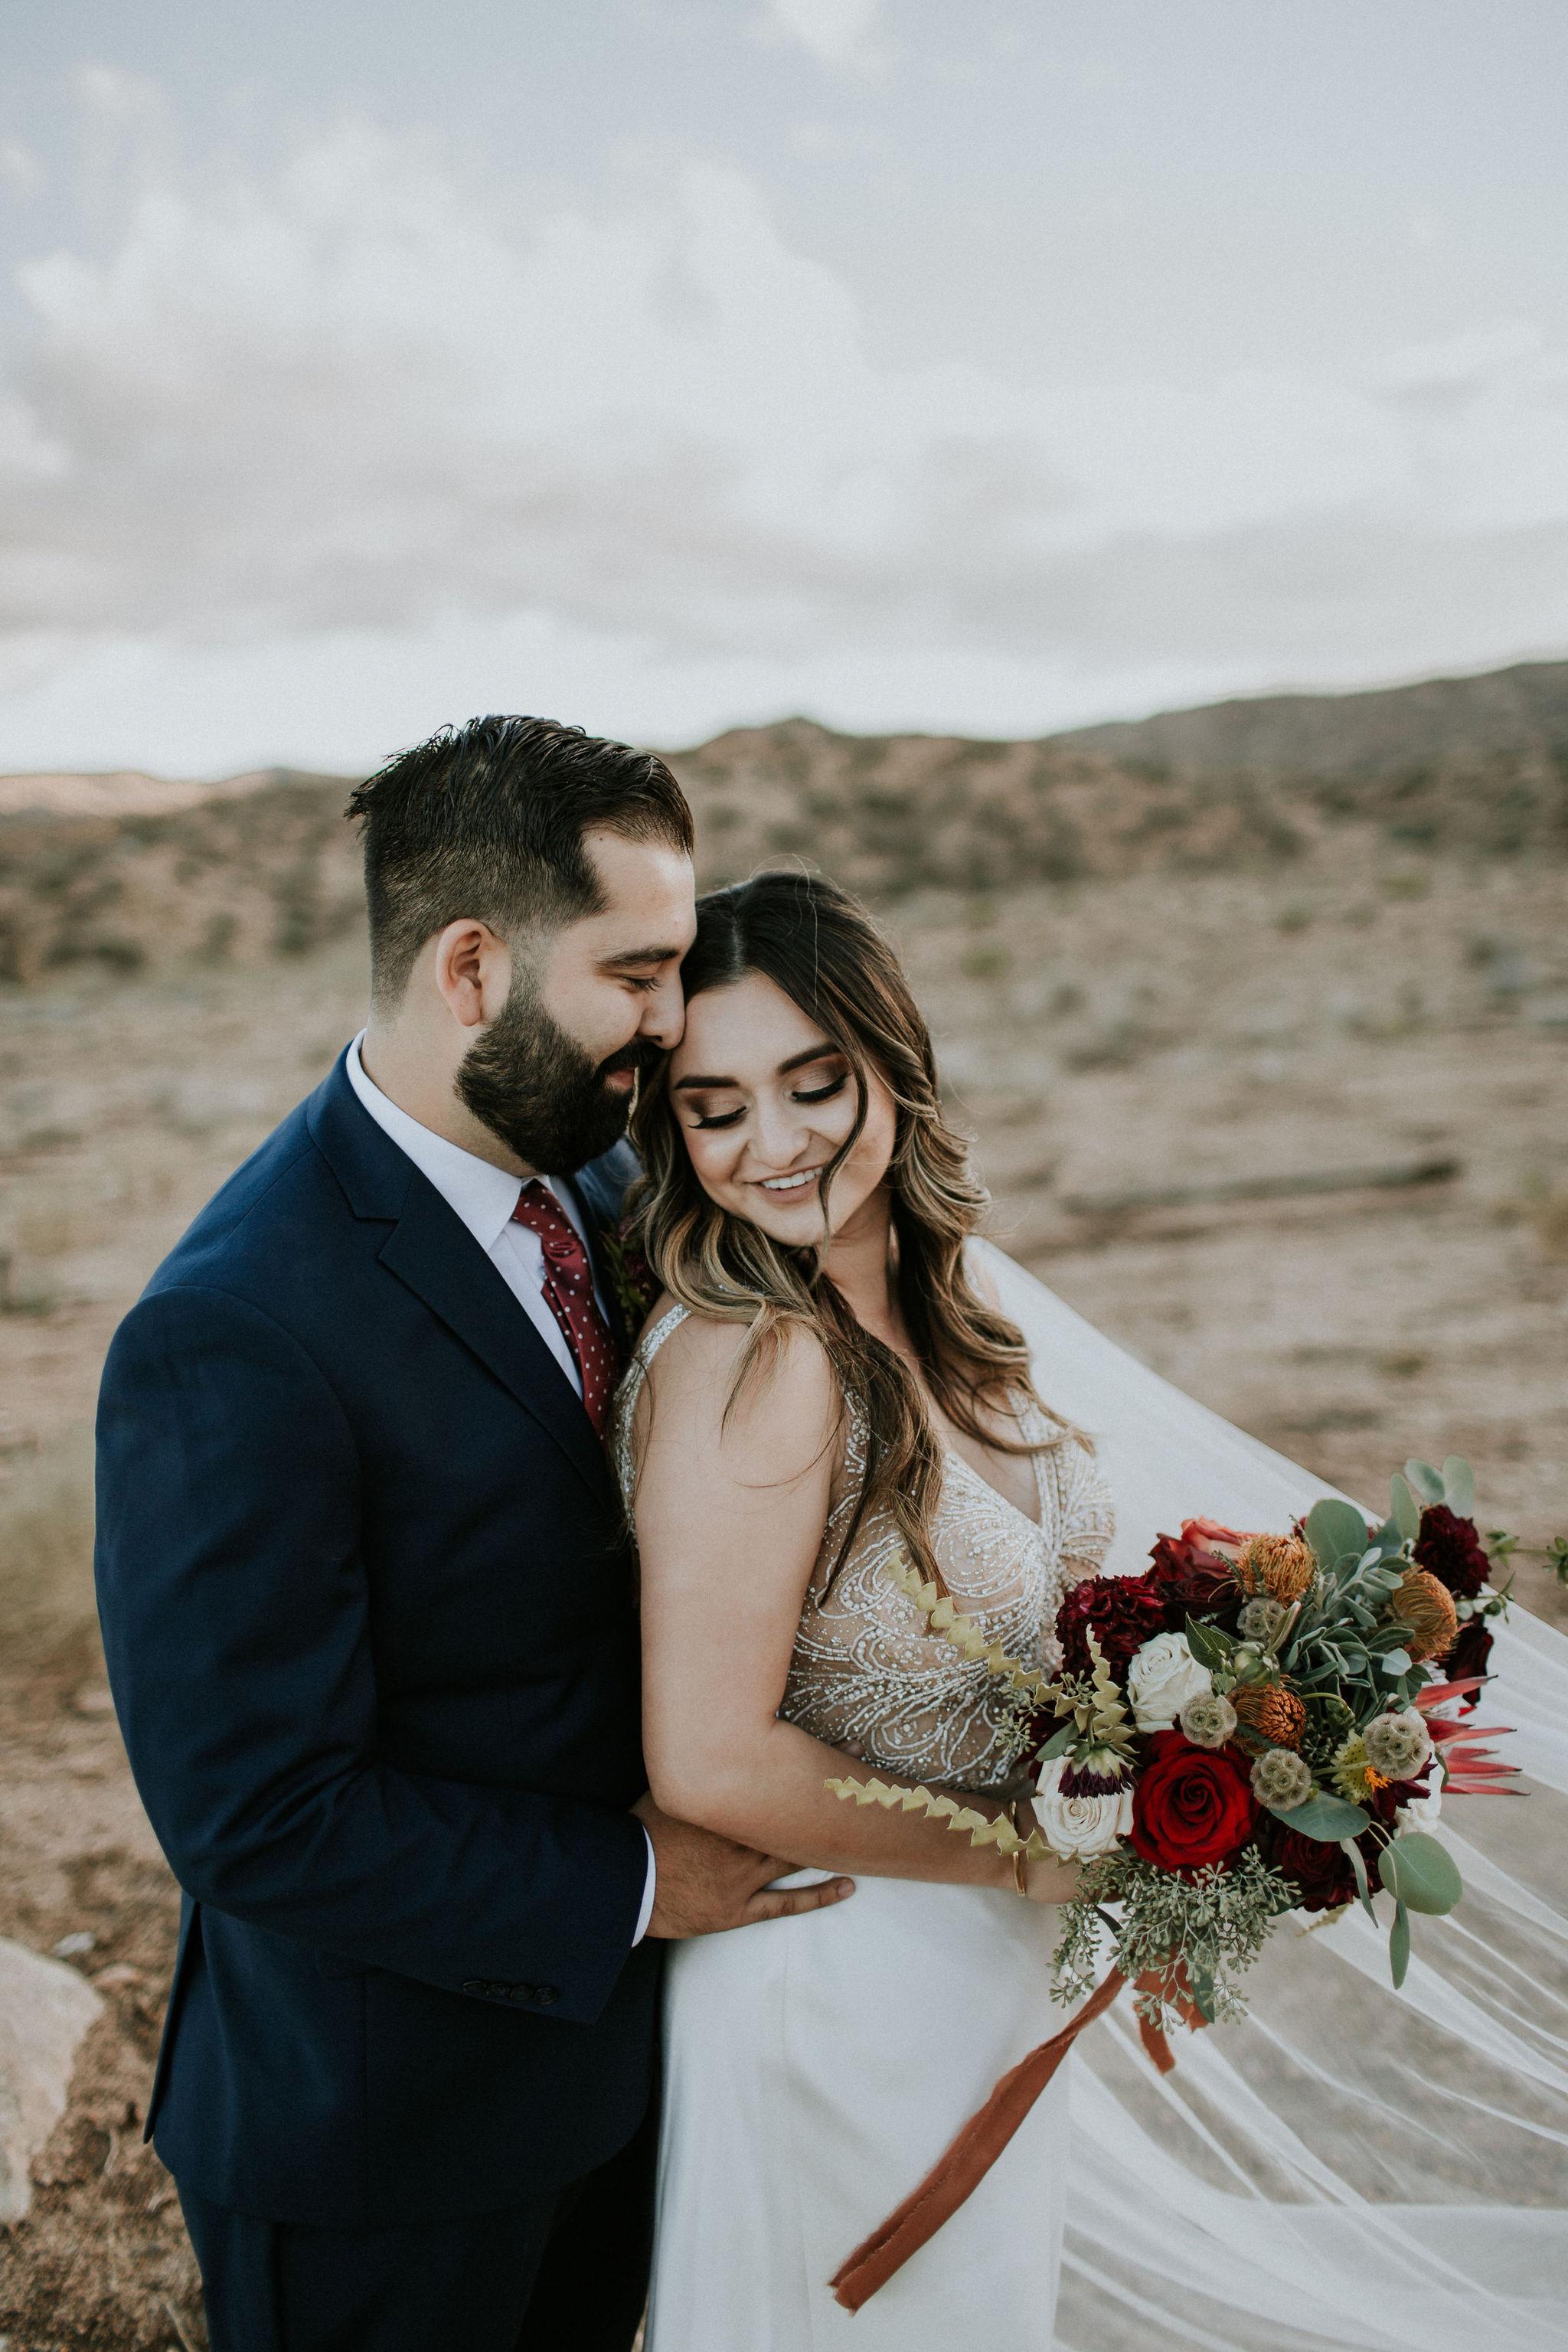 RimrockRanch-JoshuaTree-Wedding-Jami-Laree-668.jpg